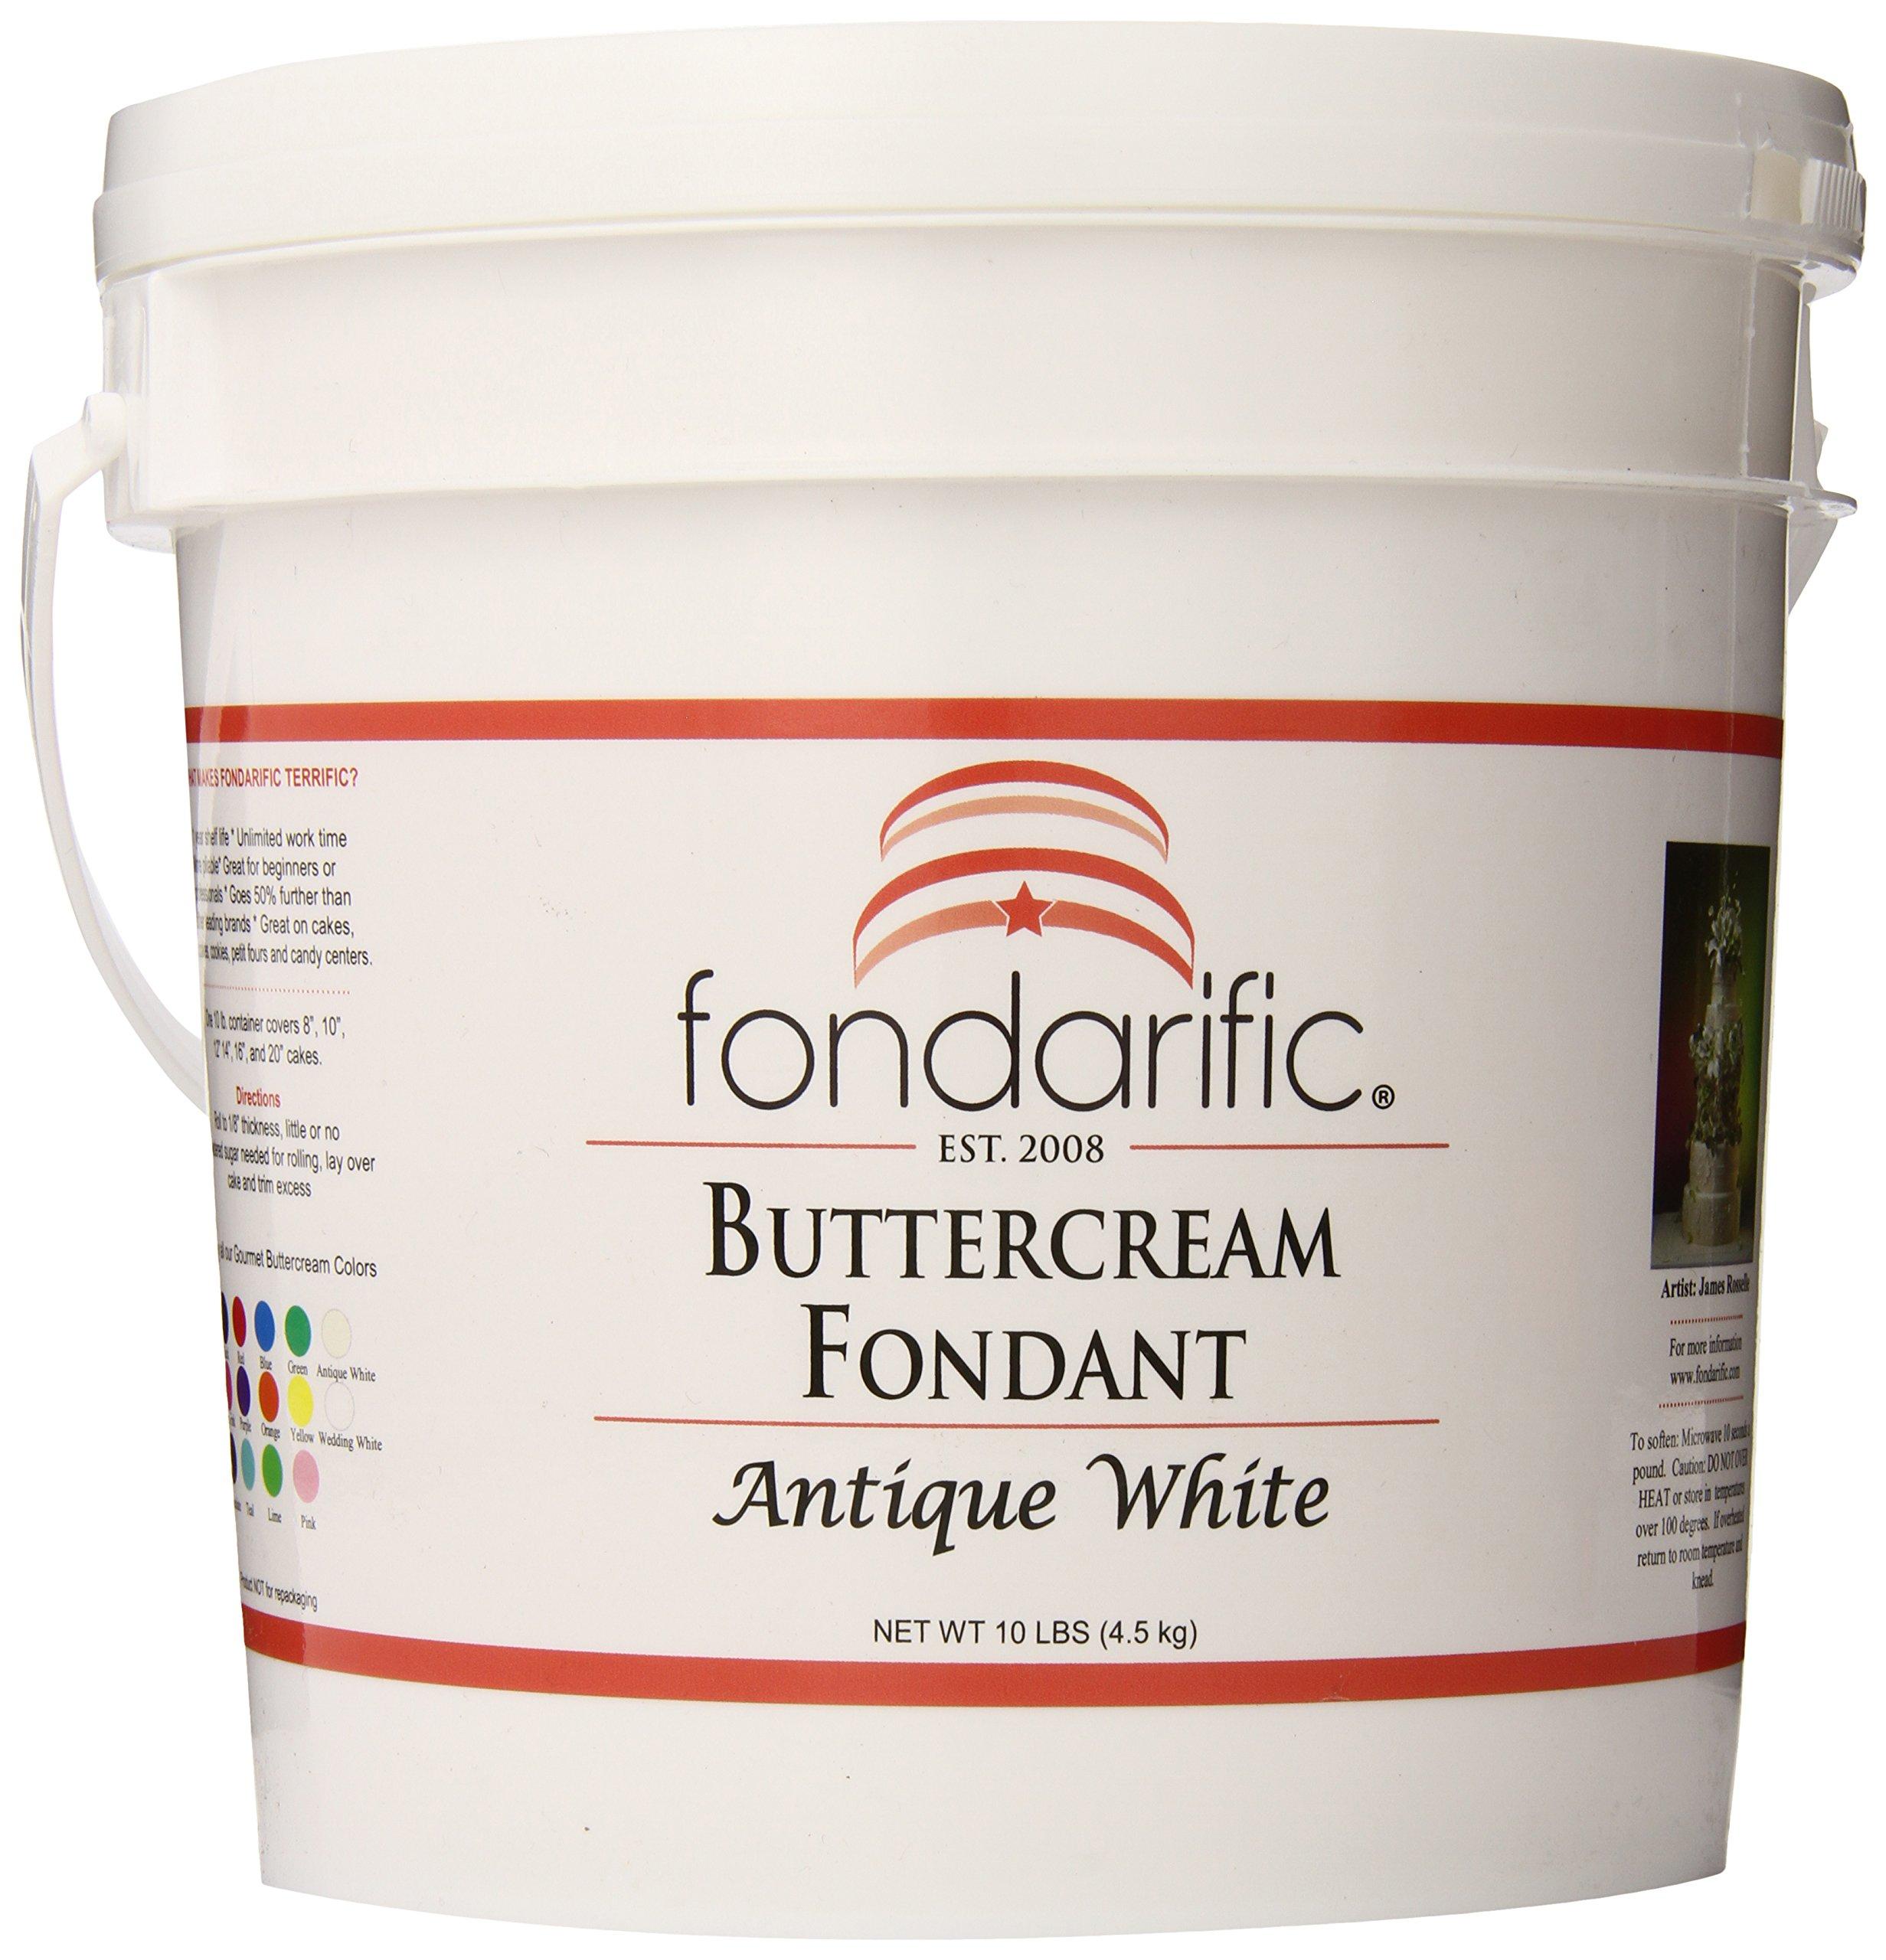 Fondarific Buttercream Antique White Fondant, 10-Pounds